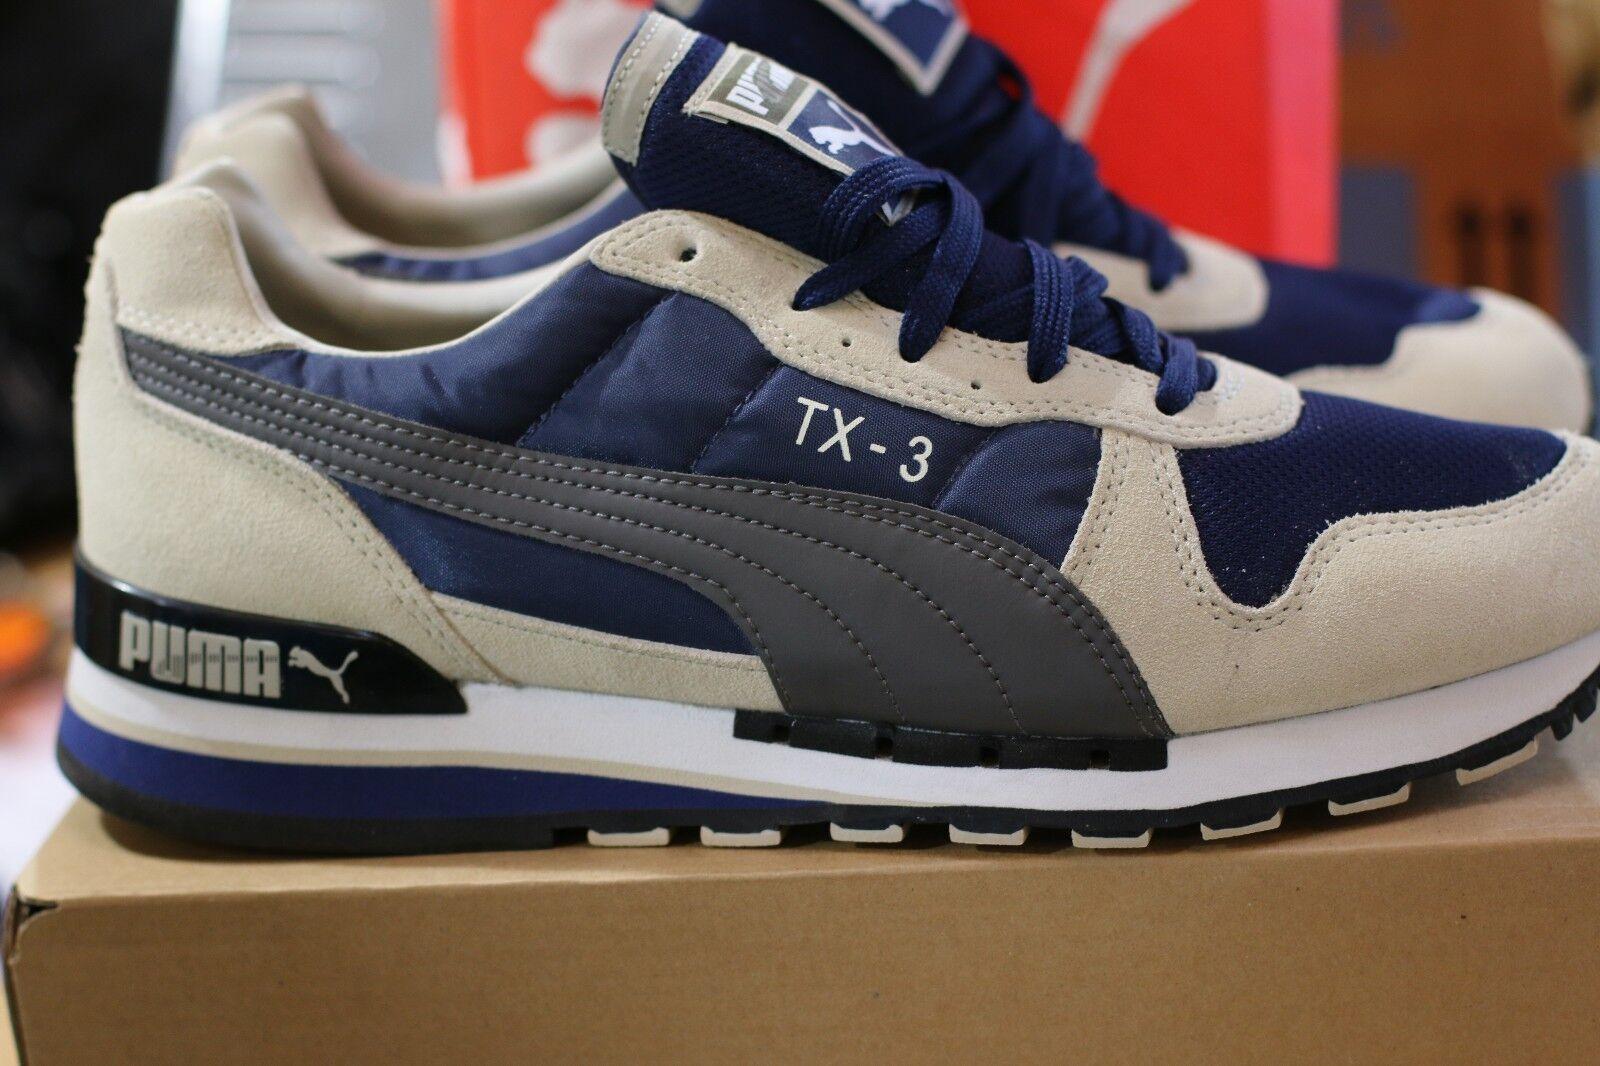 Puma Men shoes Tx-3 Navy bluee and Cream color with Metallic Grey Puma Strip